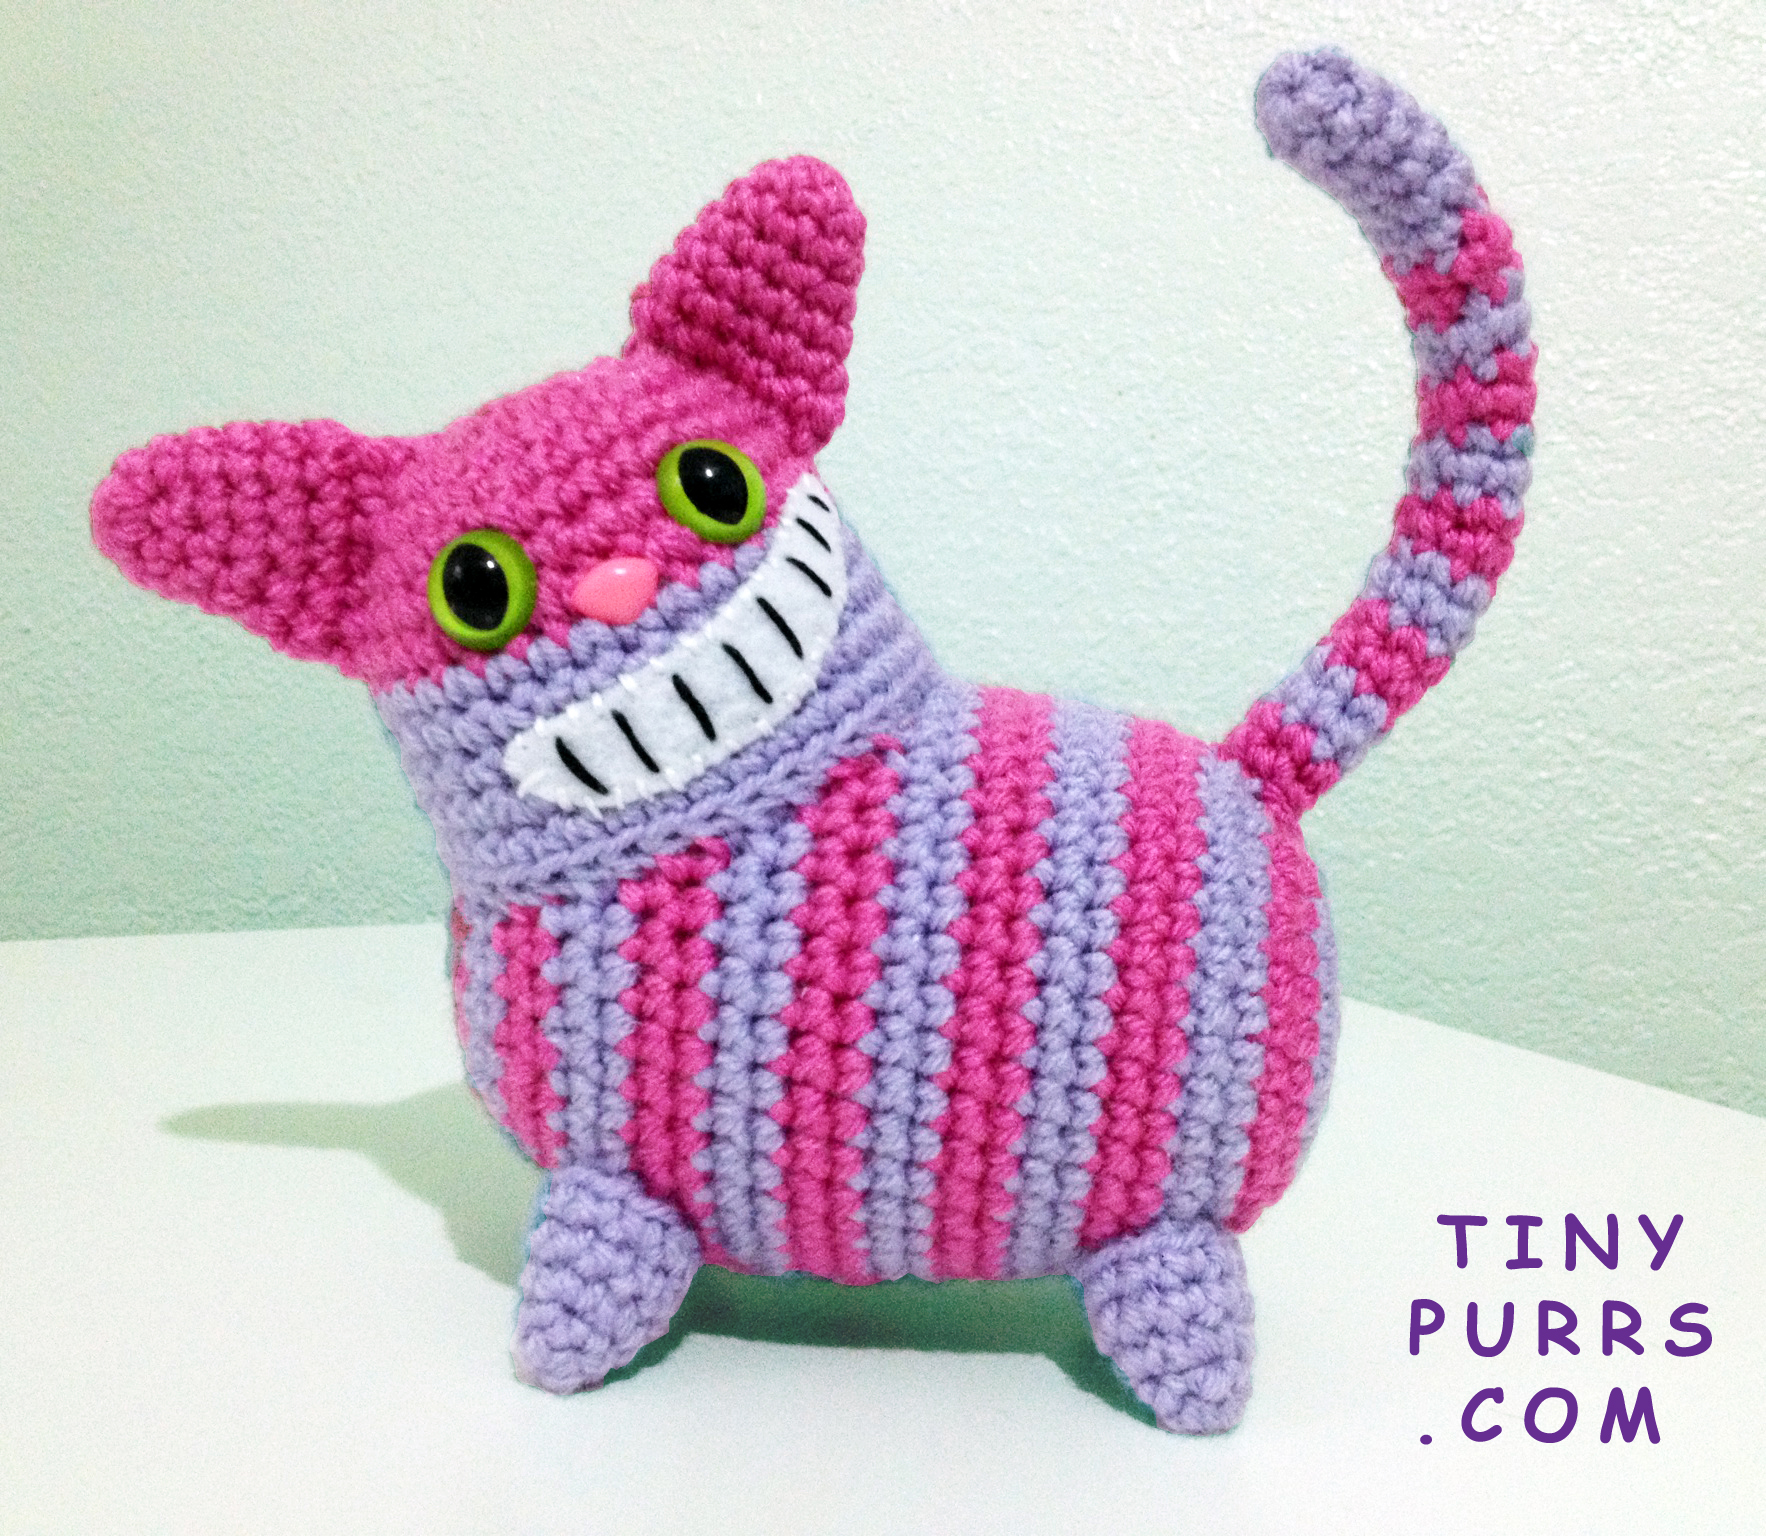 Cheshire Cat Amigurumi Crochet Pattern : amigurumi Tiny Purrs